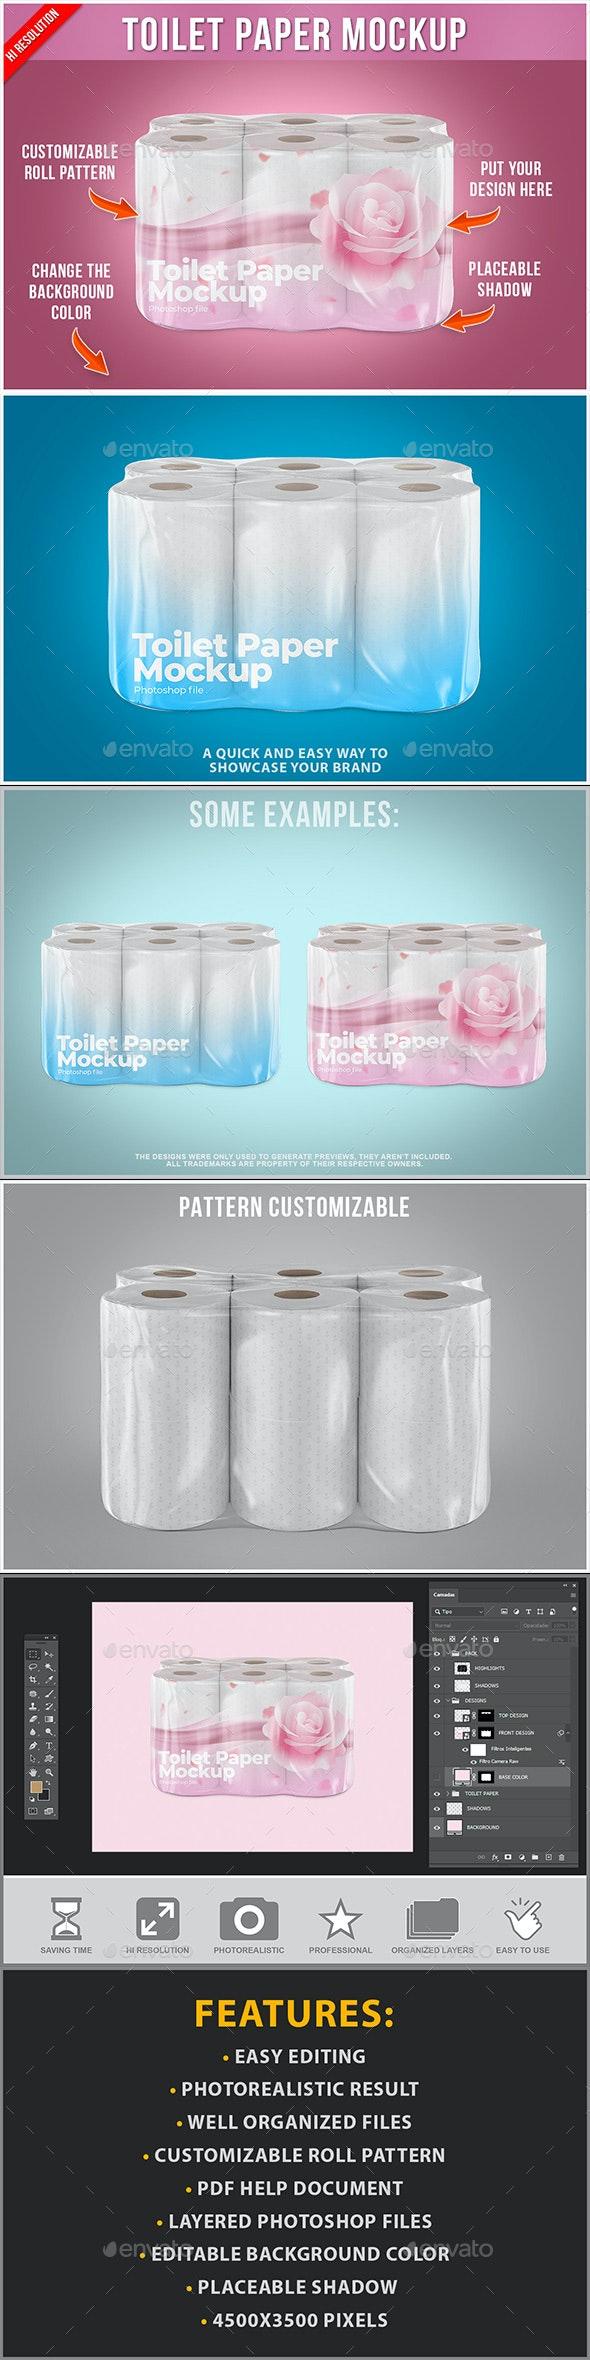 Toilet Paper Mockup - Product Mock-Ups Graphics